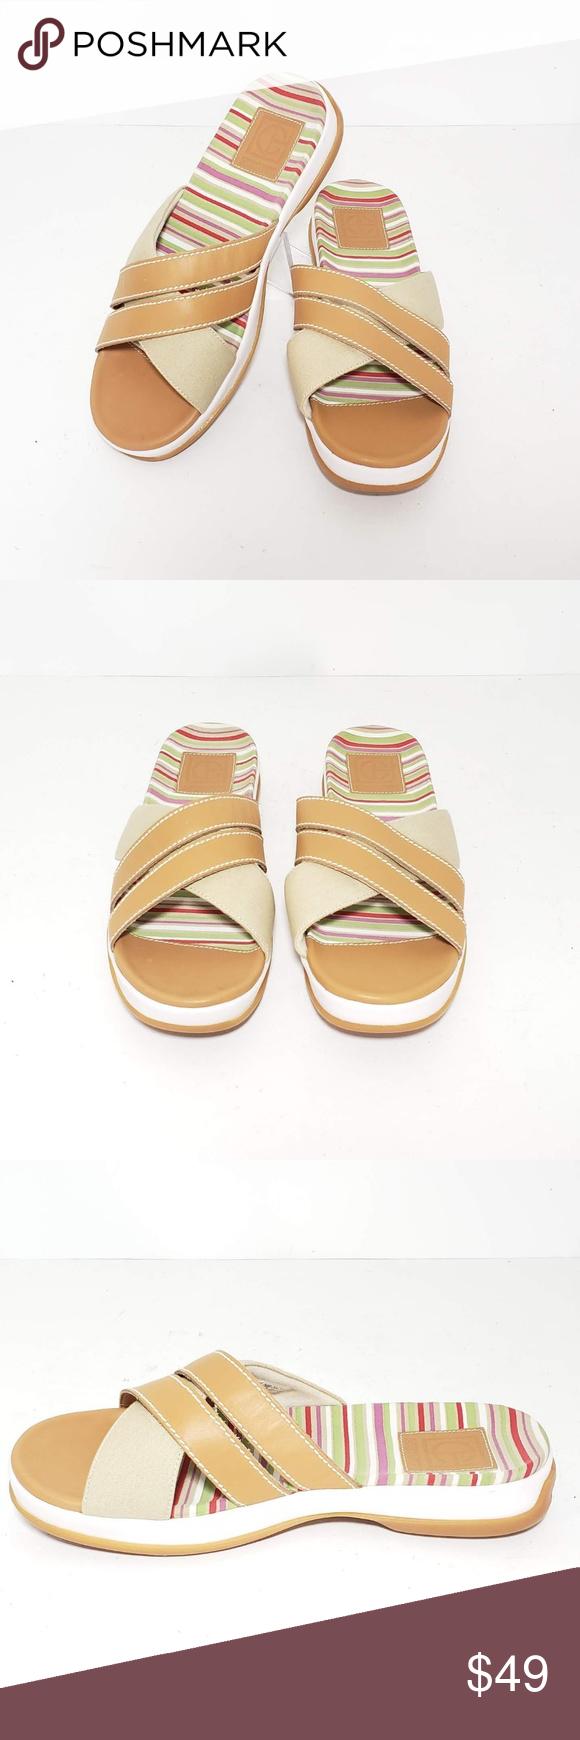 742df04bf Cole haan Open Toe Slides Flip Flops Sandal 7.5B Cole haan Women Slides Flip